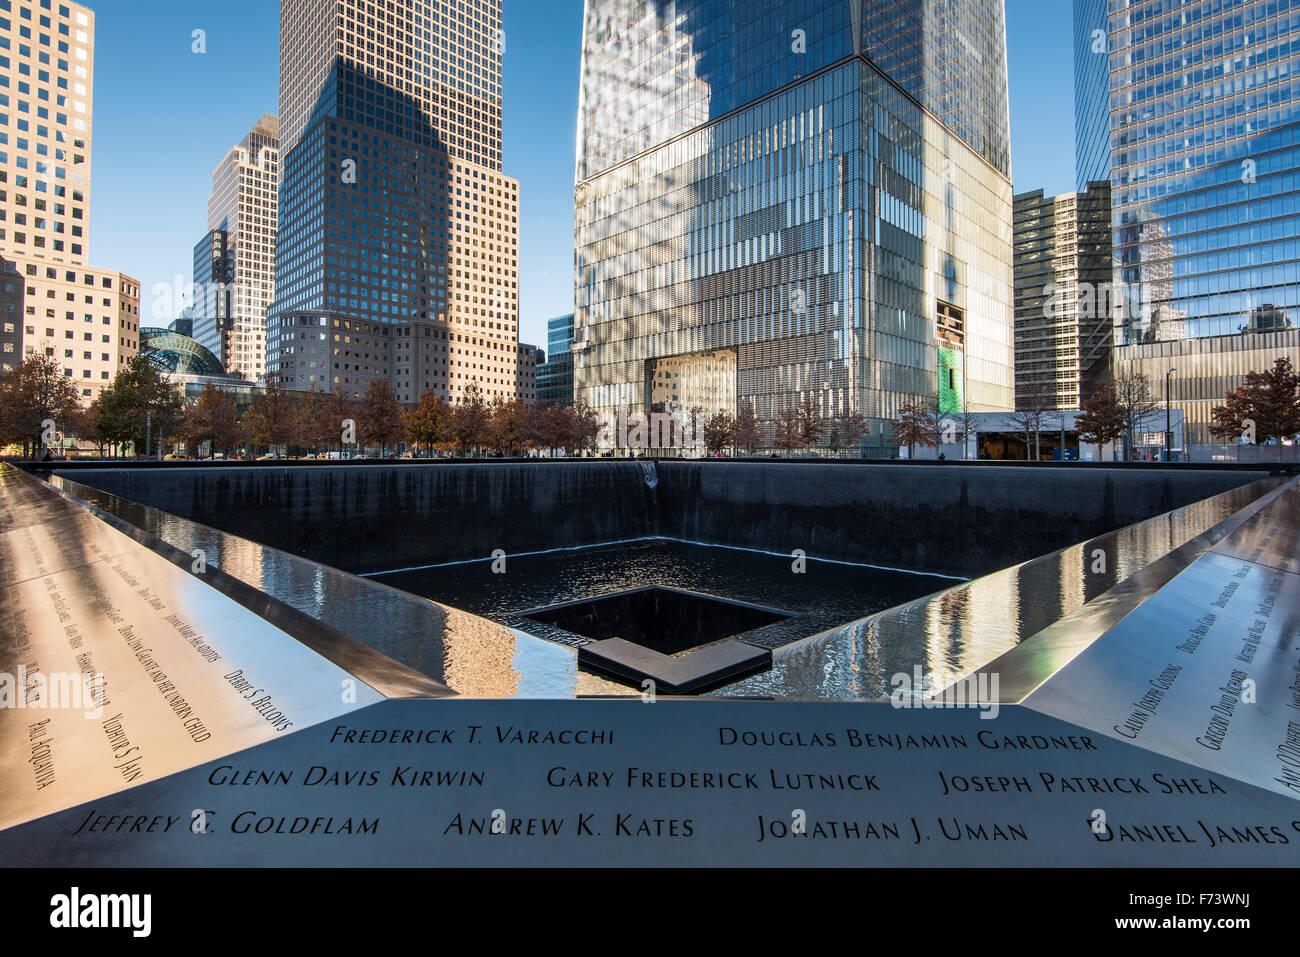 Nördlichen Pool, National September 11 Memorial & Museum, Lower Manhattan, New York, USA Stockfoto